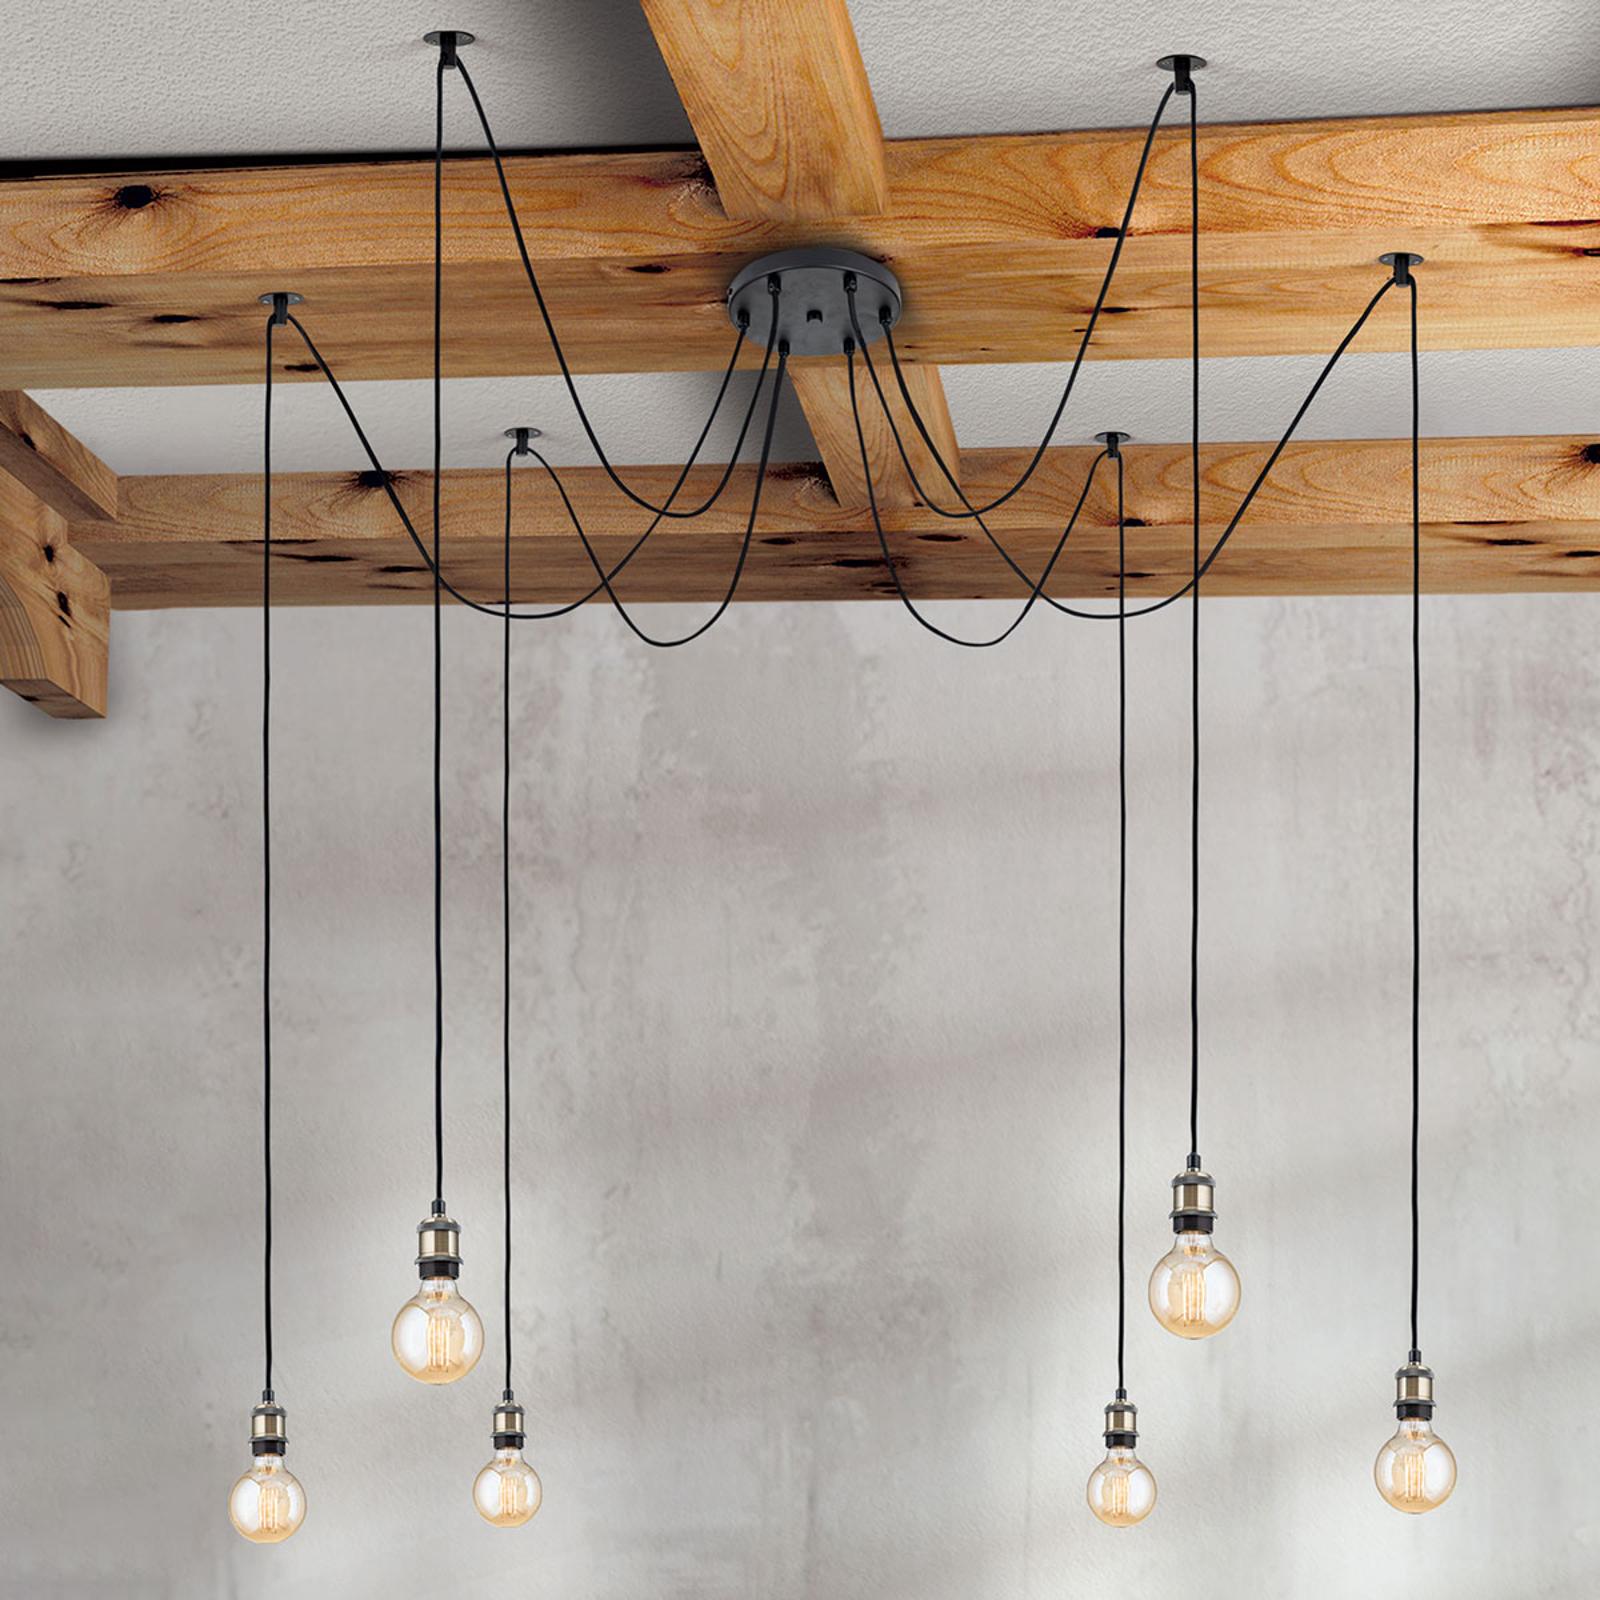 6-punktowa lampa wisząca vintage Jailhouse